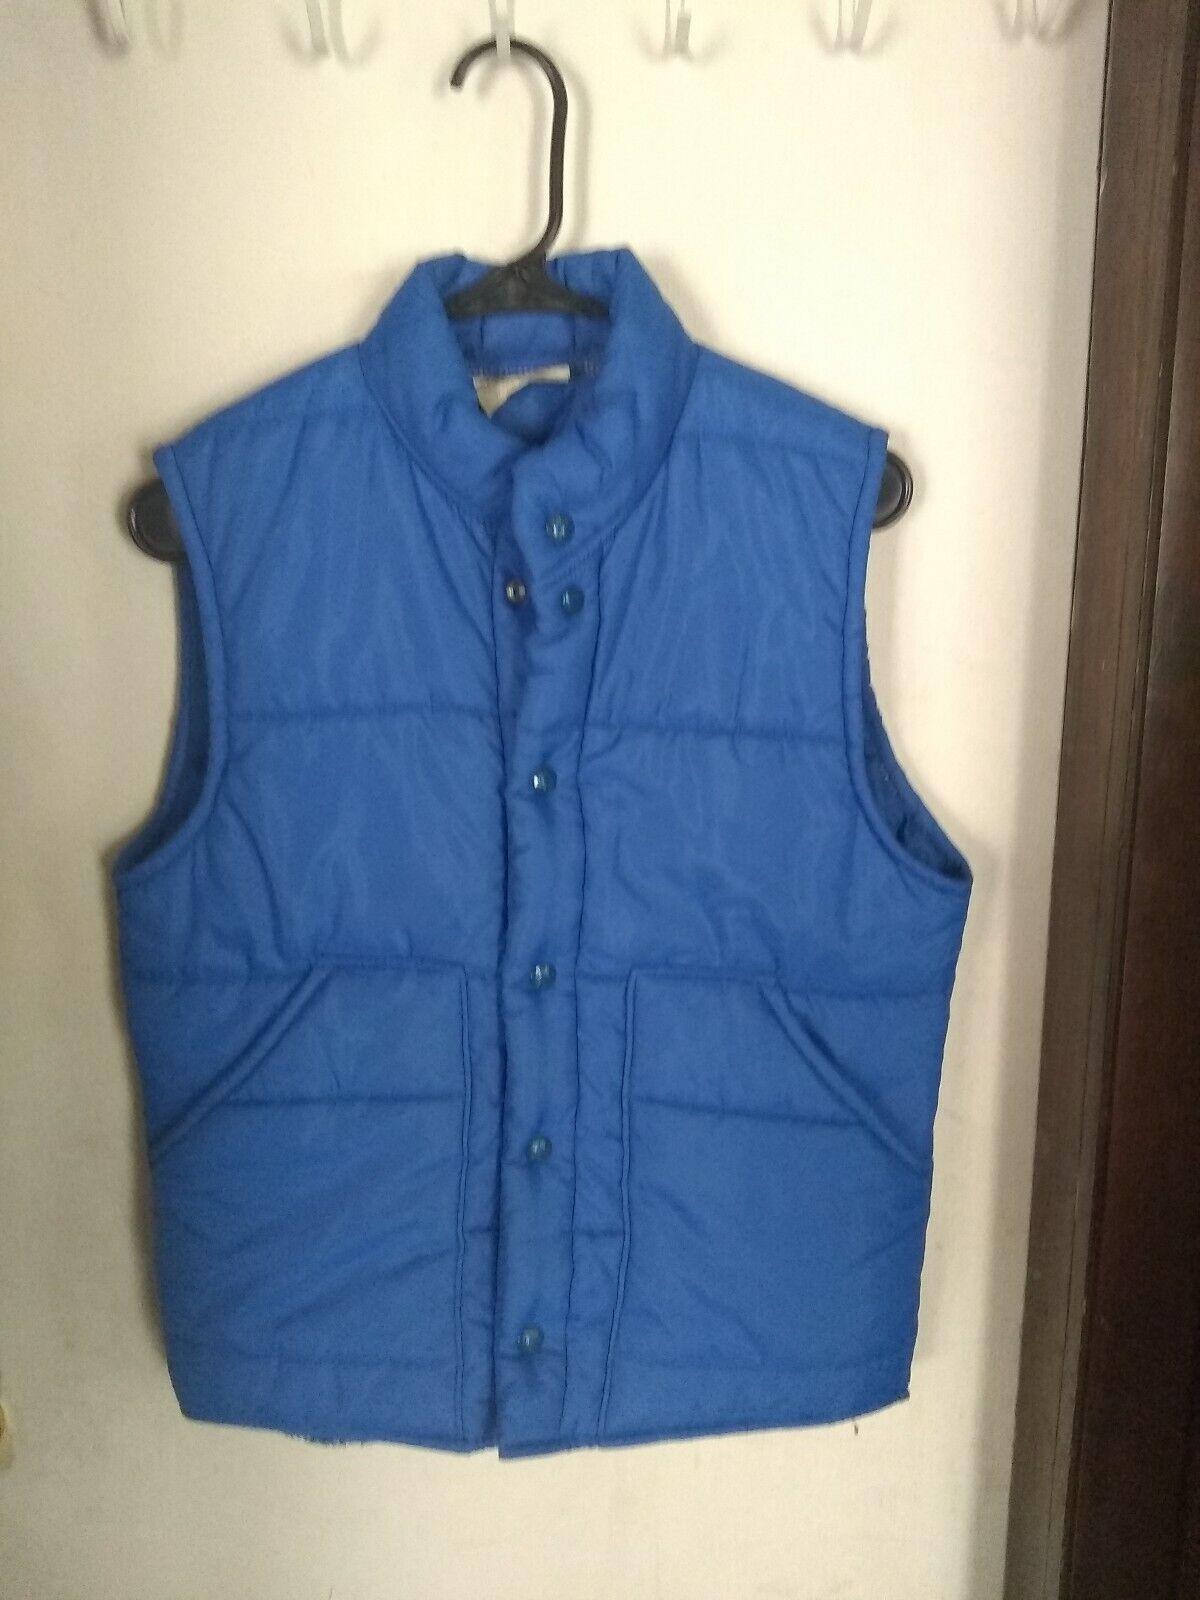 MENS VTG 70s King Louie Pro Fit Puffer Vest bluee Size 36-38 (S) Snaps USA